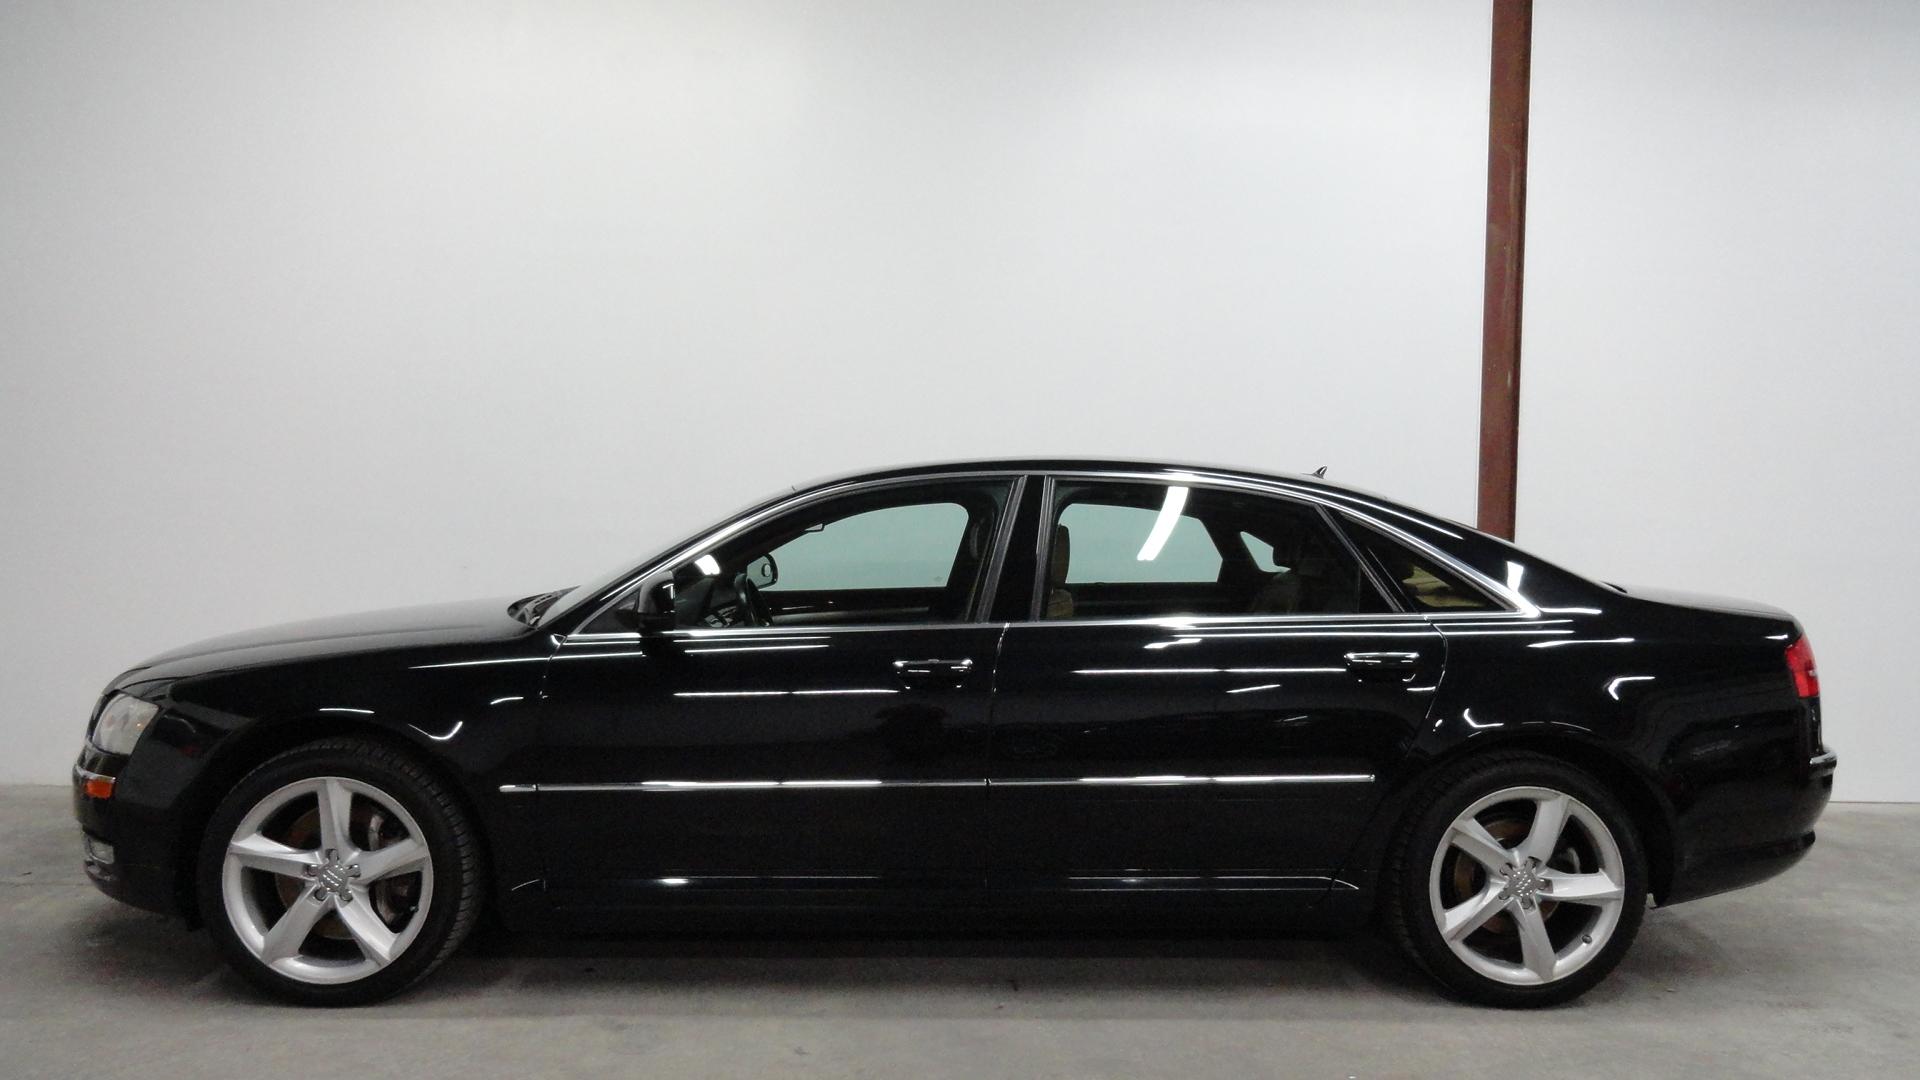 2009 Audi A8 Image 15